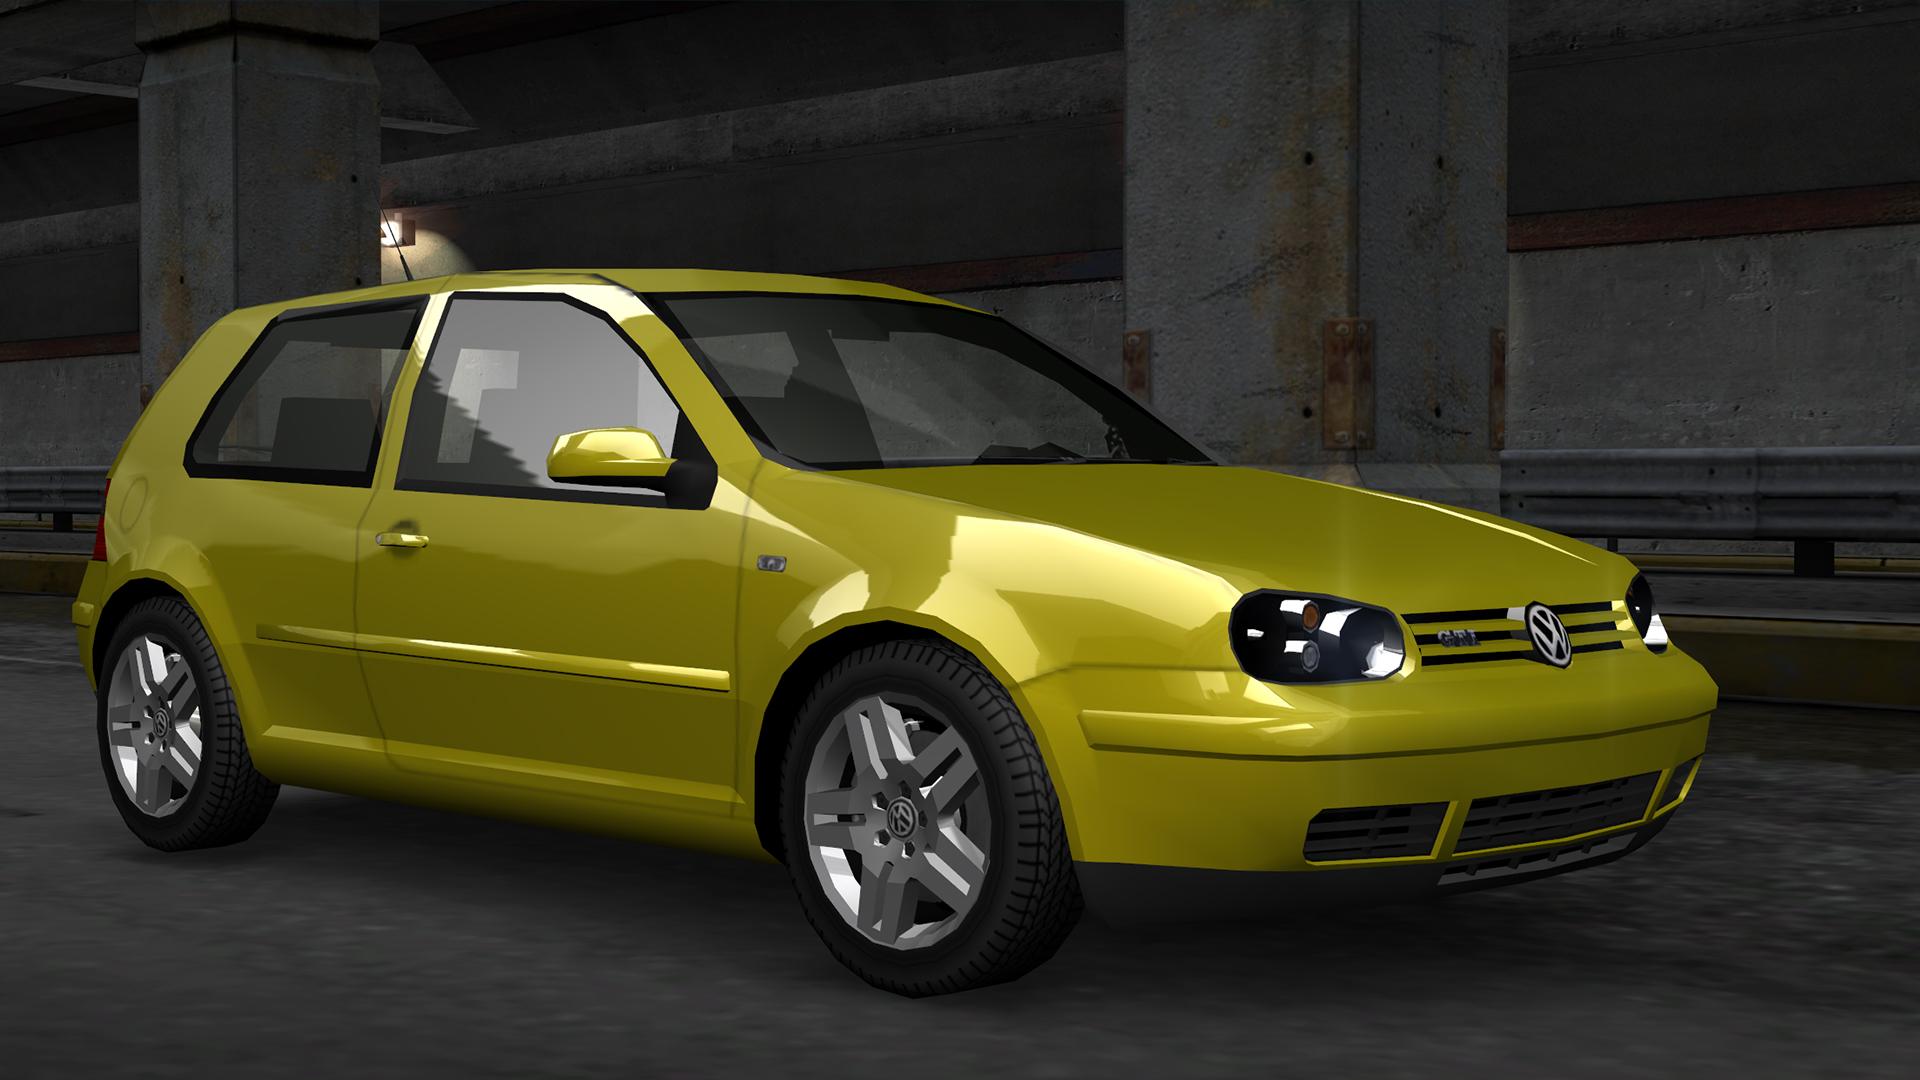 Volkswagen Golf GTI 2.0L (Mk4)